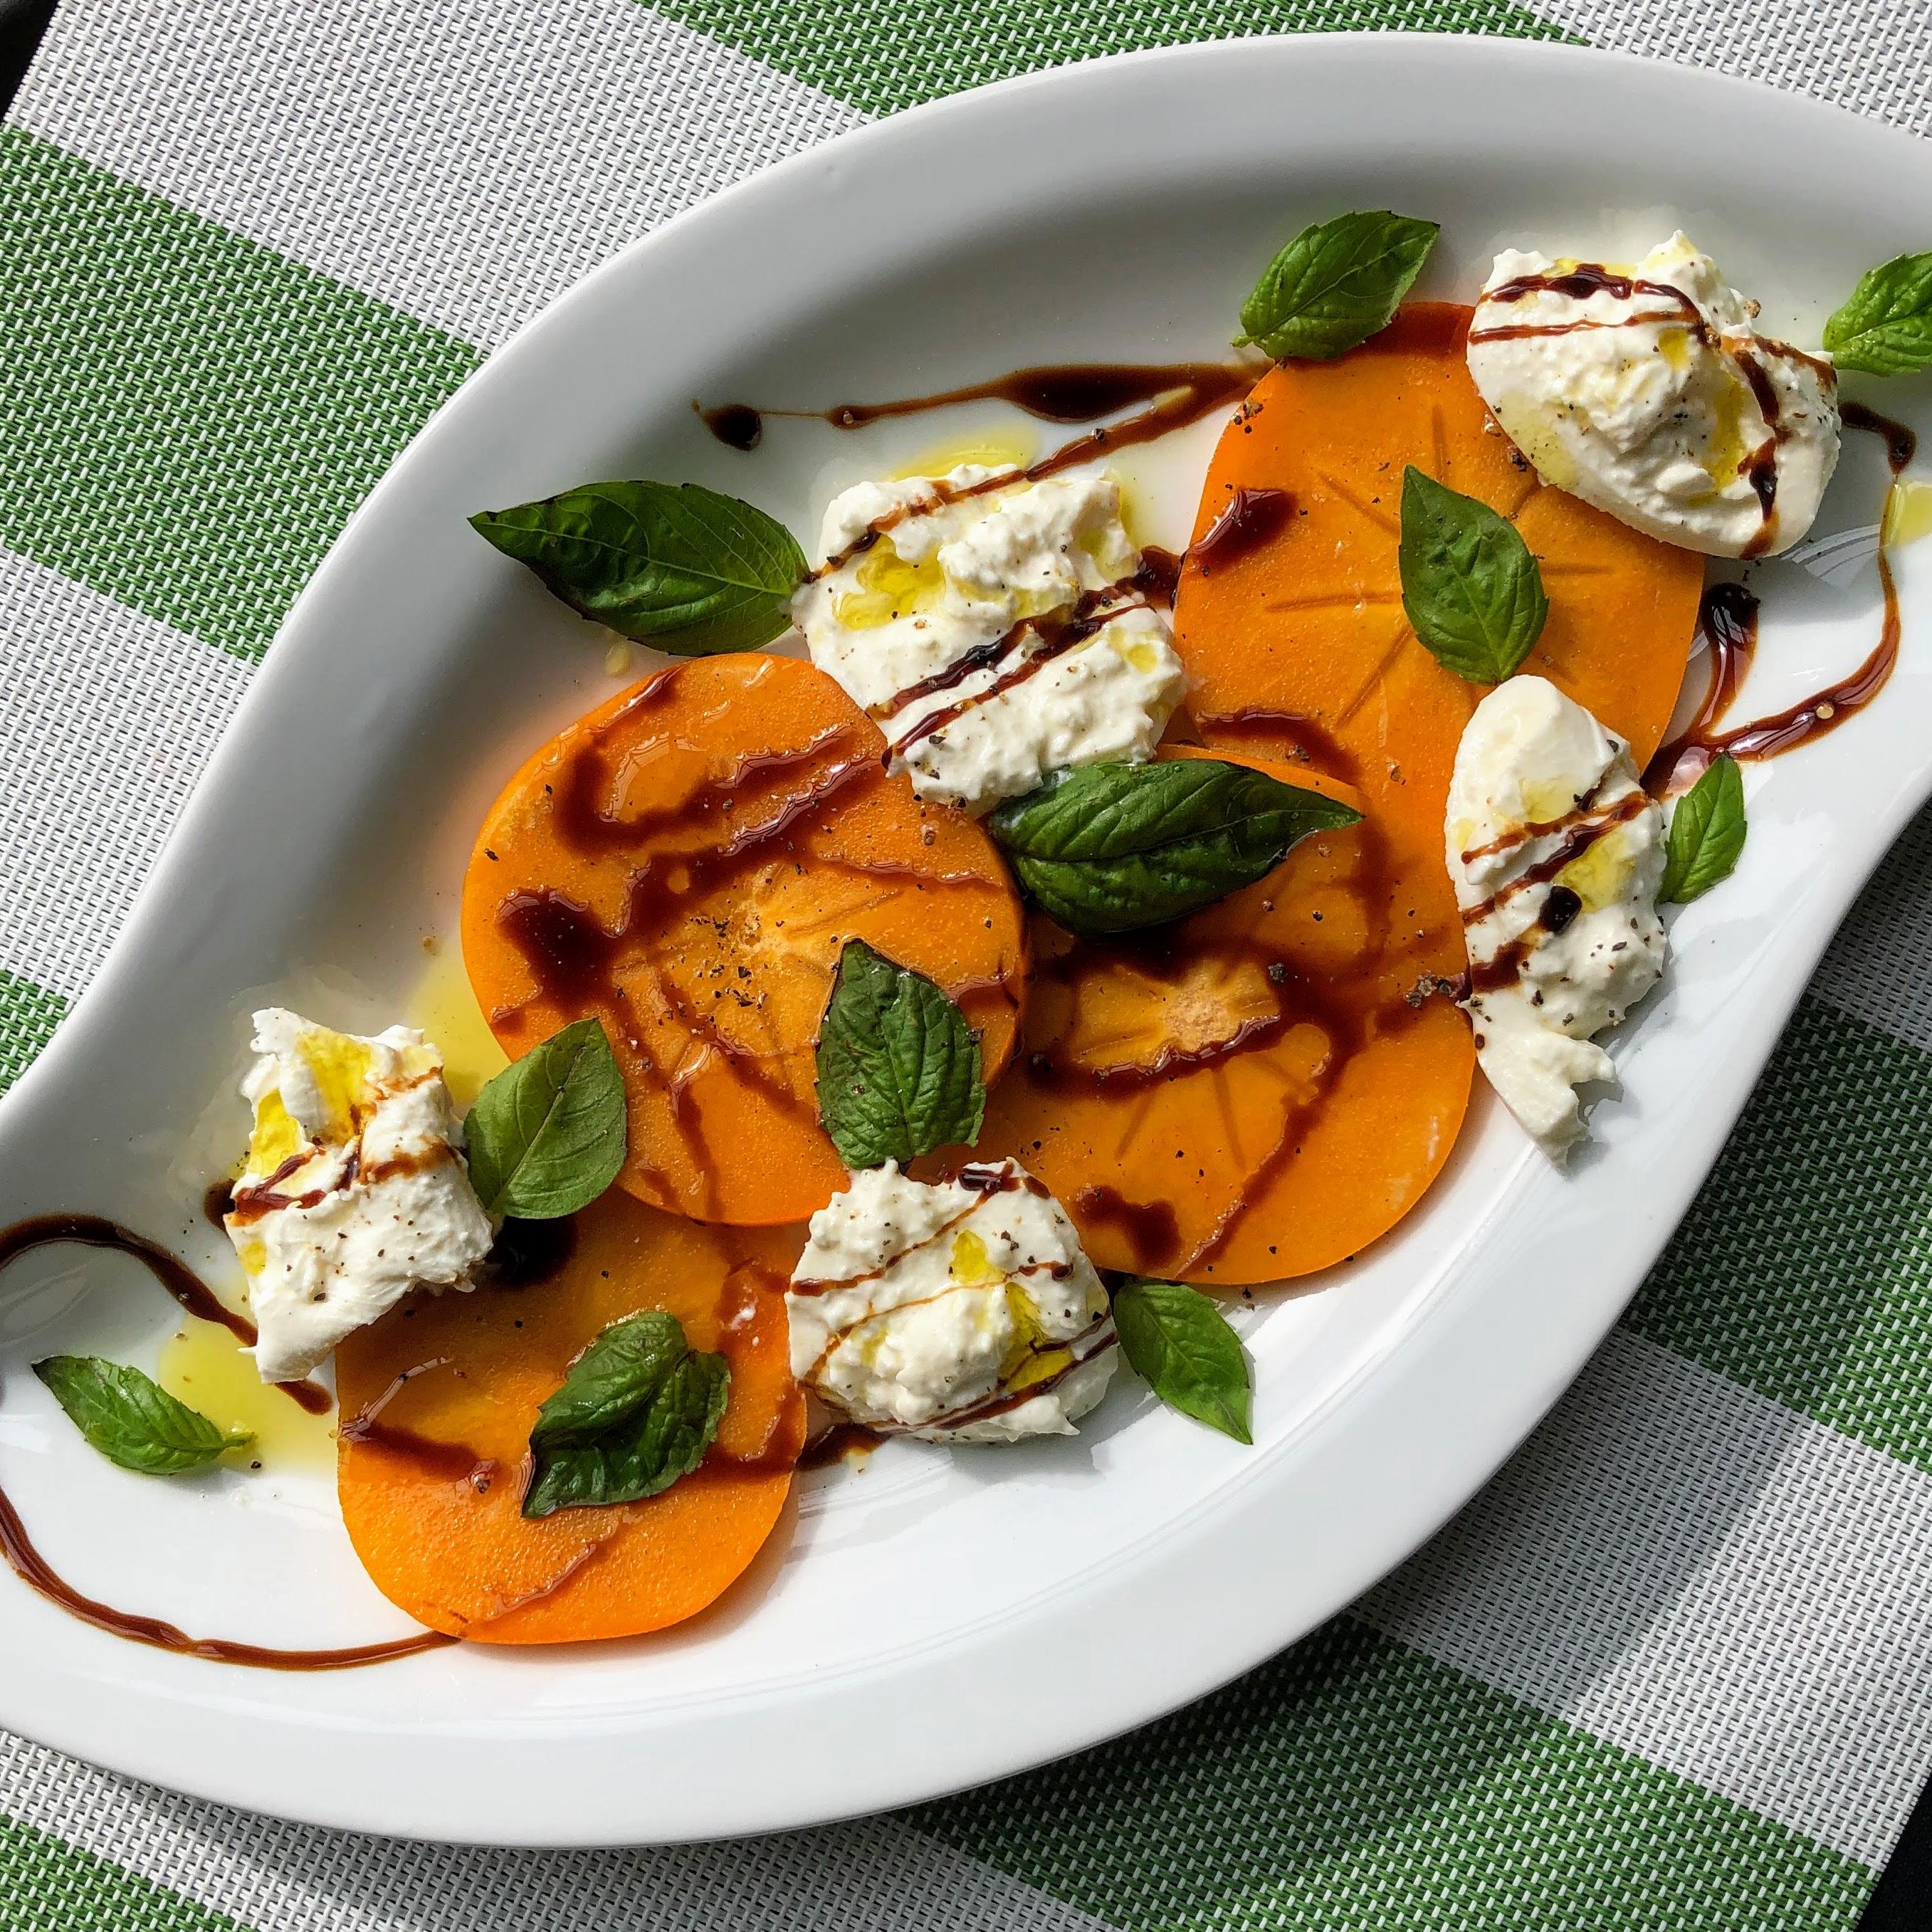 Fuyu Persimmon and Burrata Caprese Salad